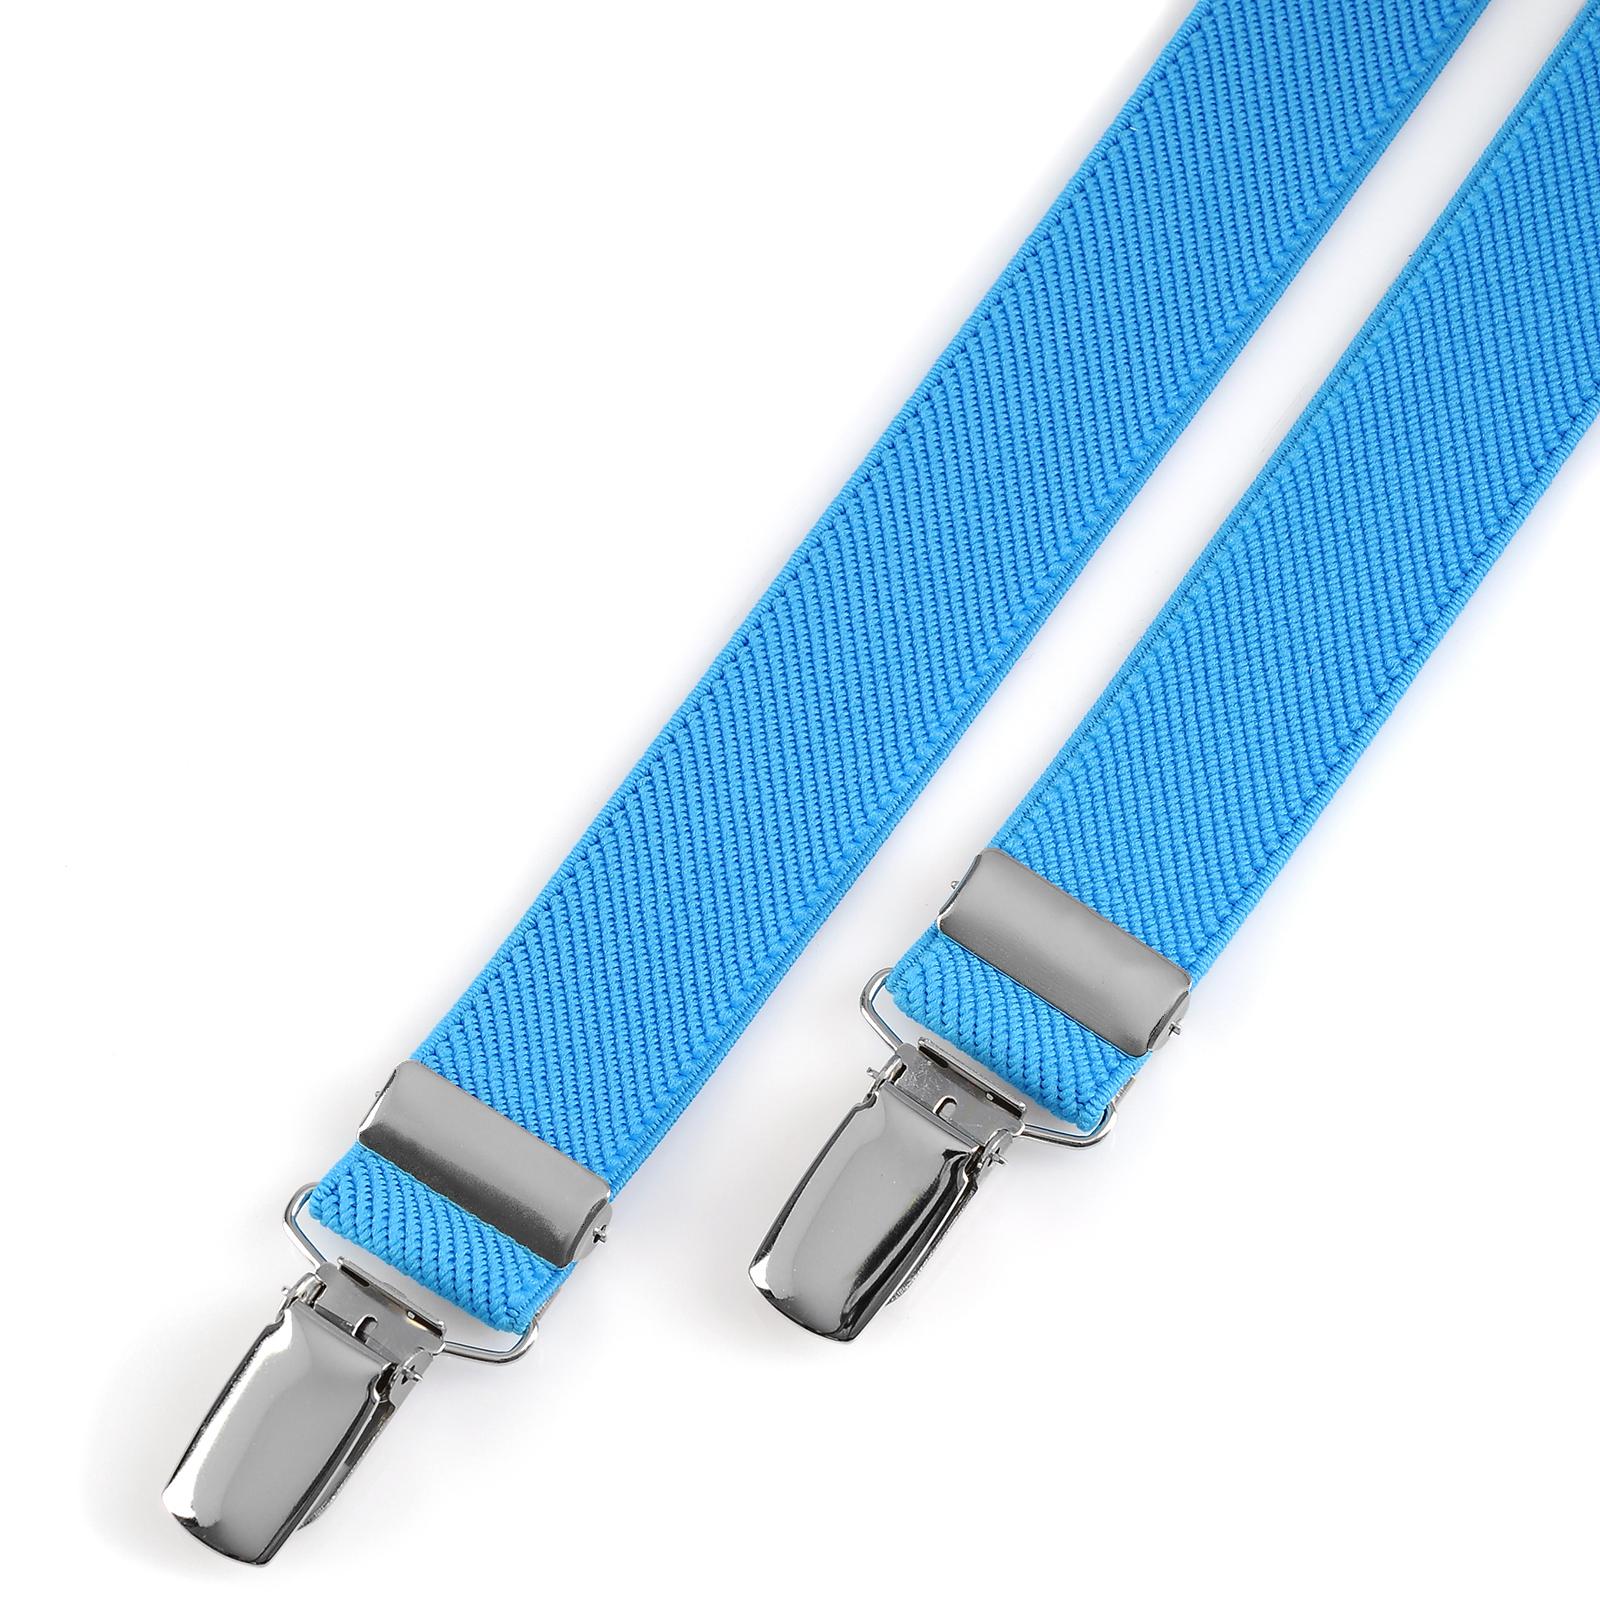 BT-00237-bretelles-homme-fines-bleu-azur-F16